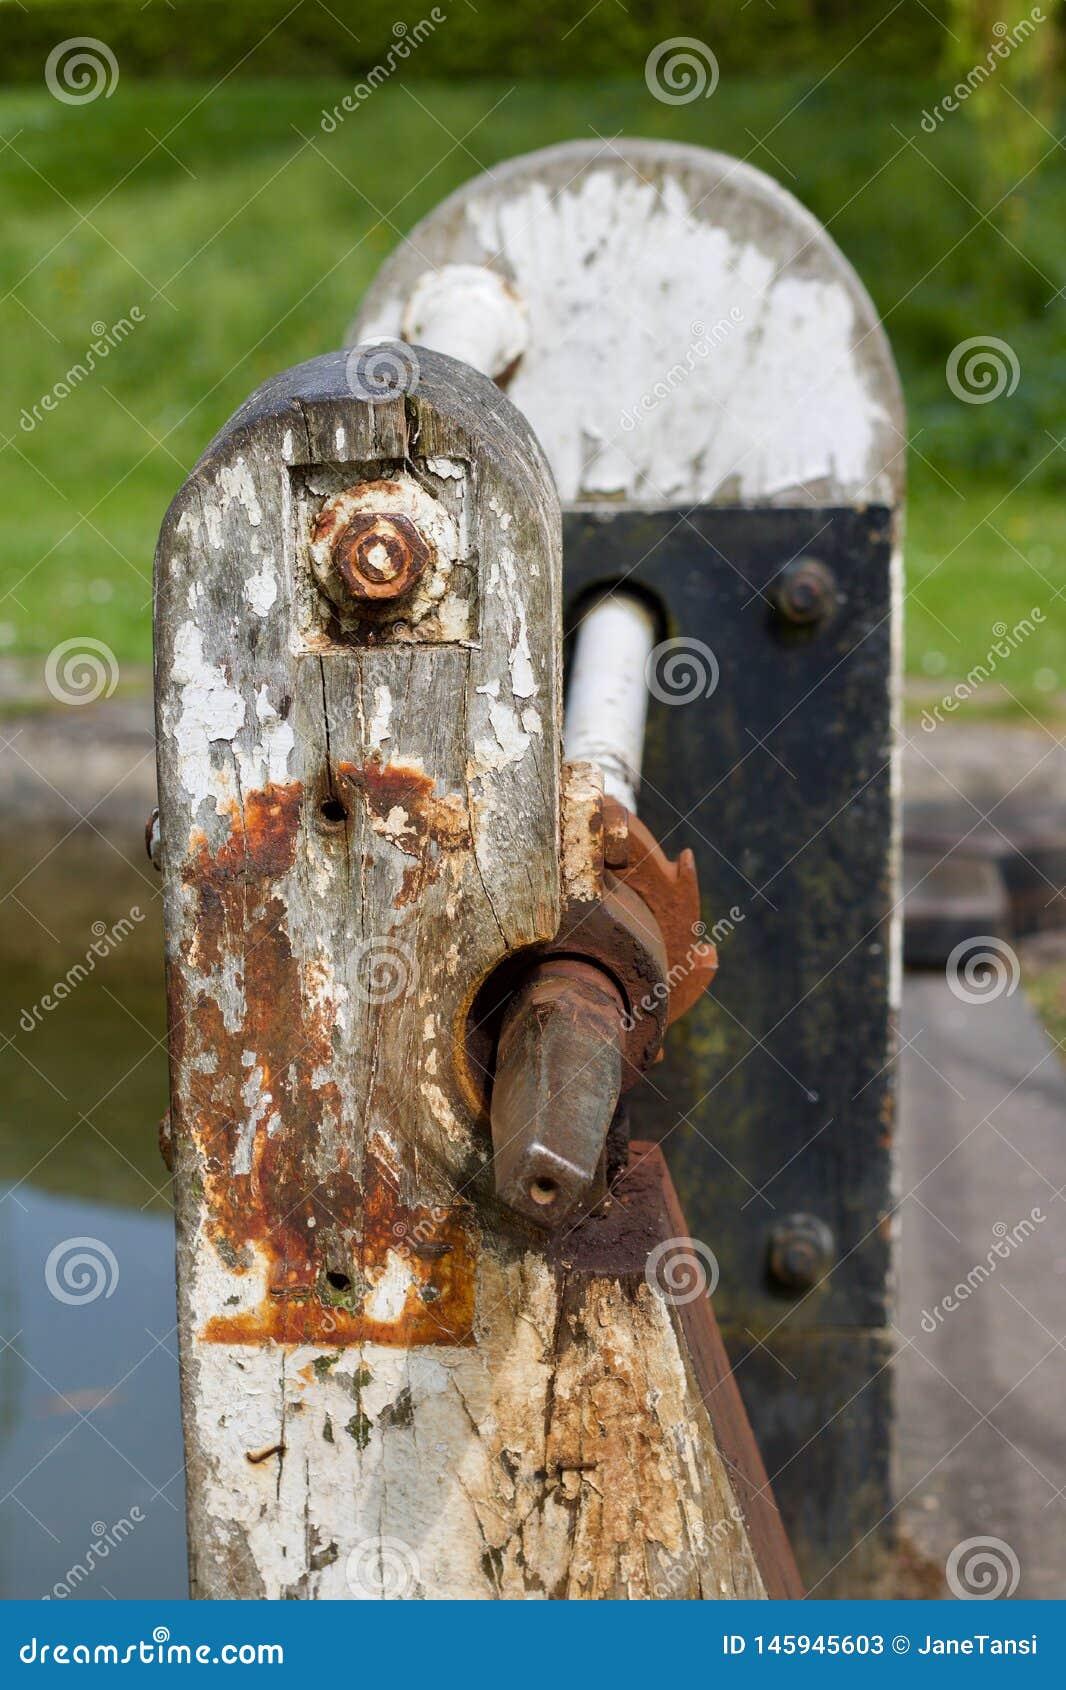 Rusty Old Canal Lock Gate-Mechanisme - Beeld